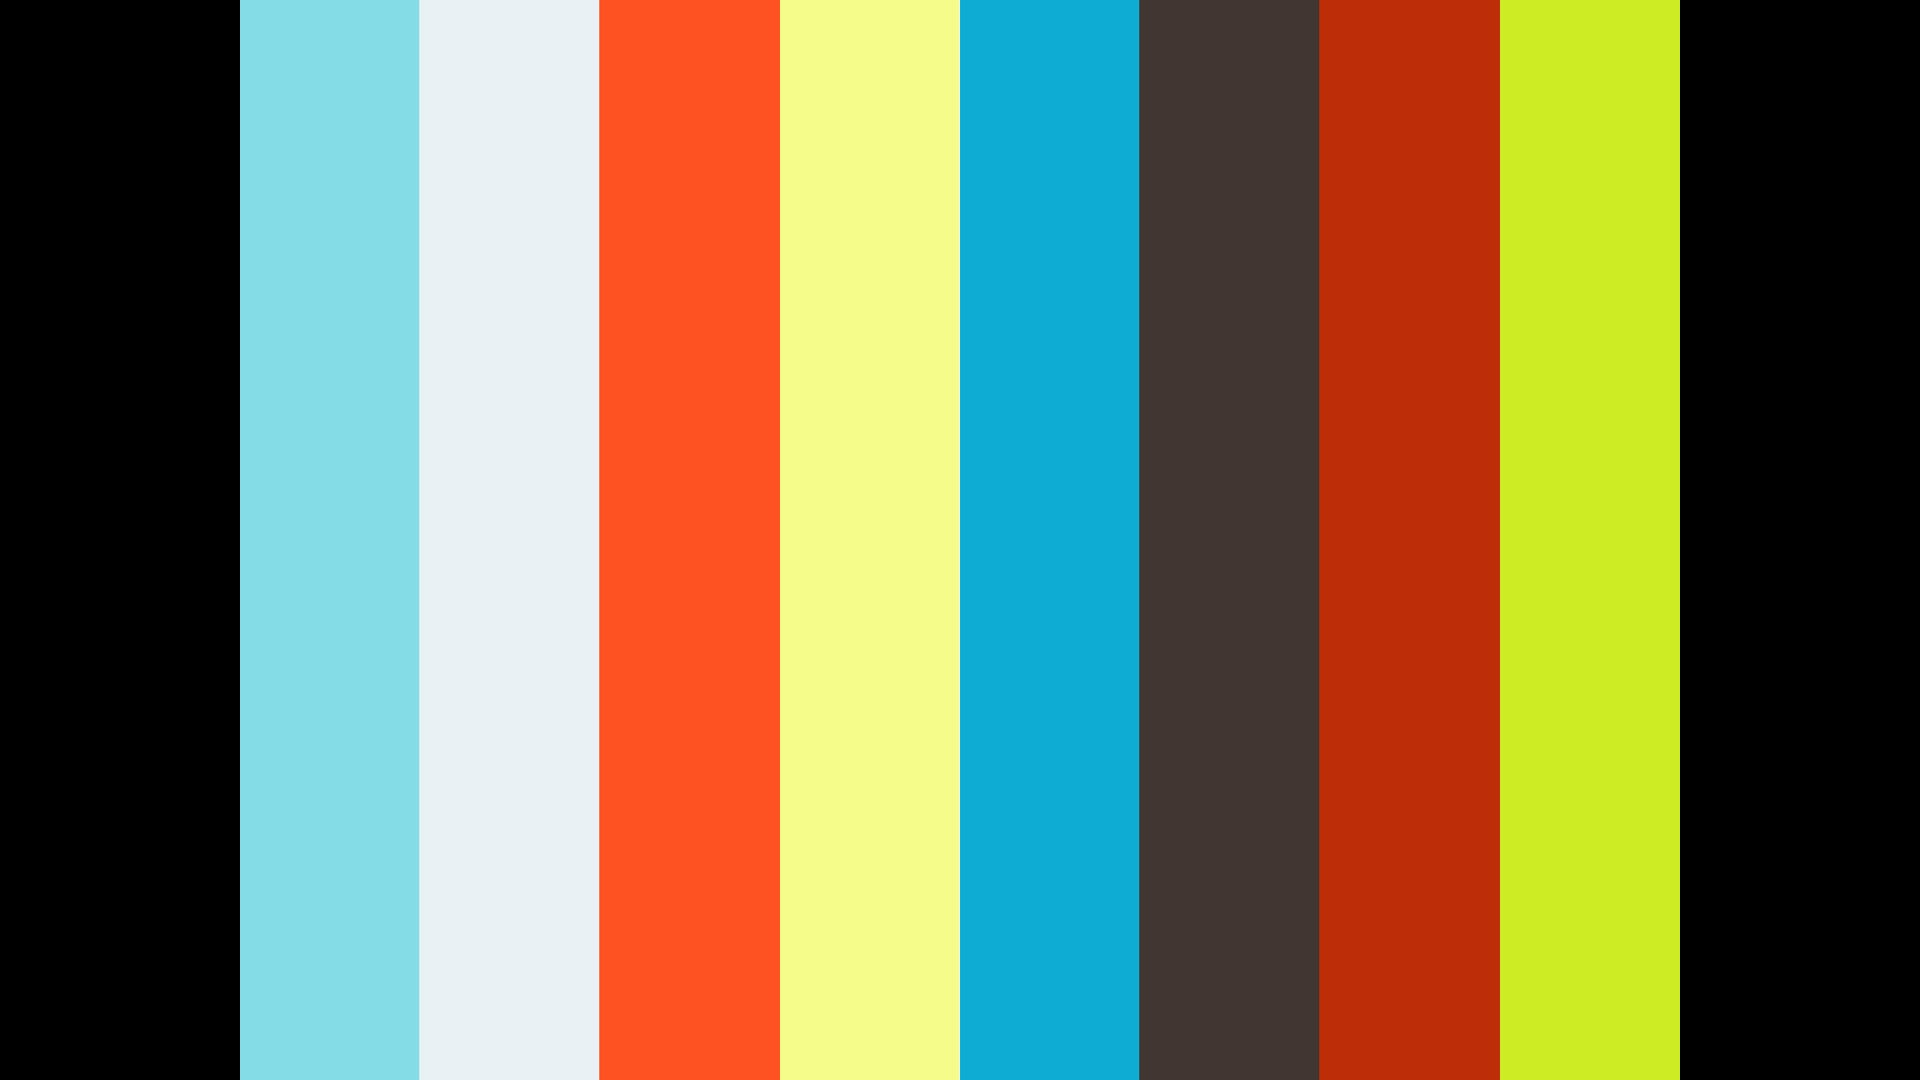 WINTER 2K15 SWAGGY YOLOS (Enhanced)